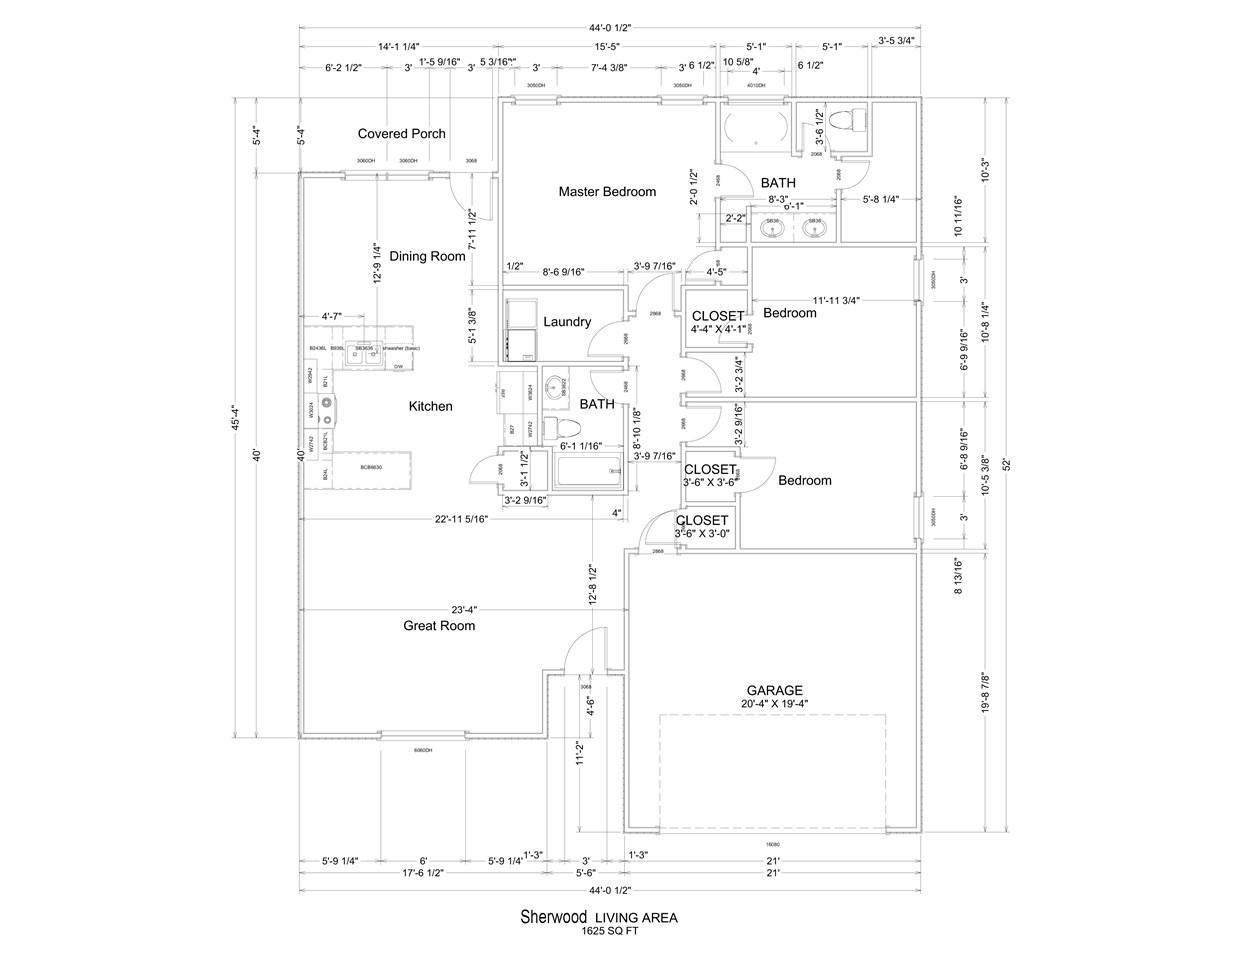 313 Catterick Way, Fountain Inn SC, 29644